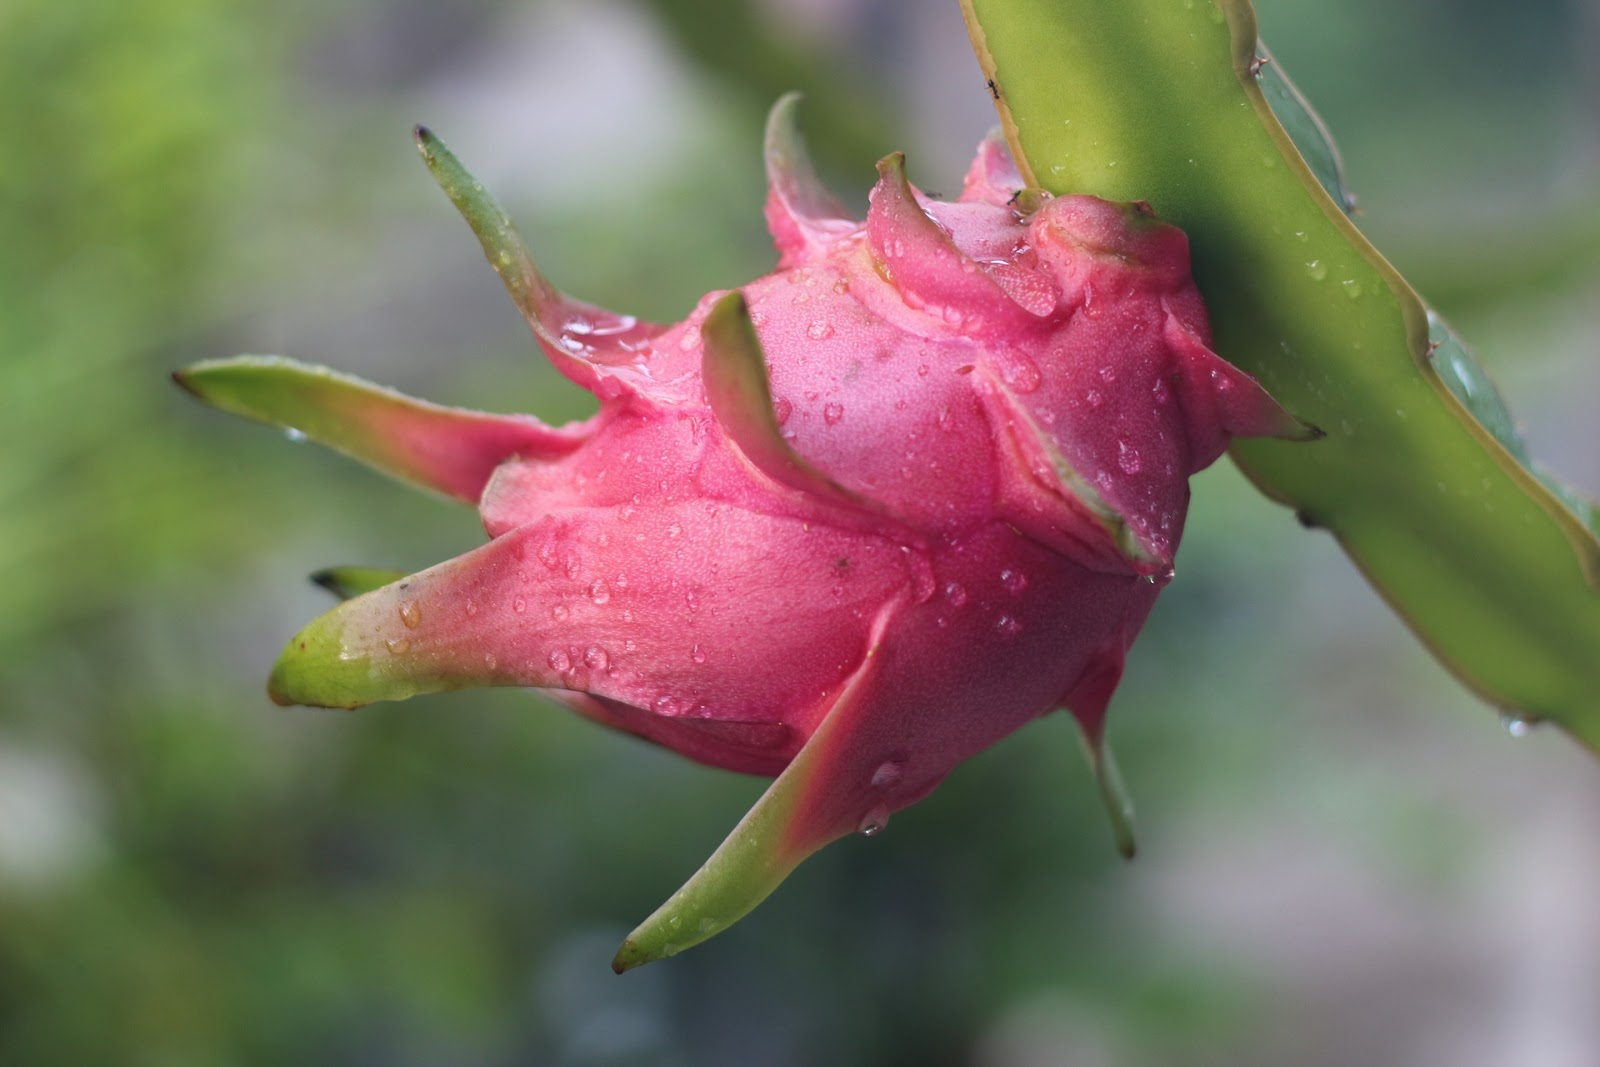 Cara merawat buah naga agar cepat berbuah